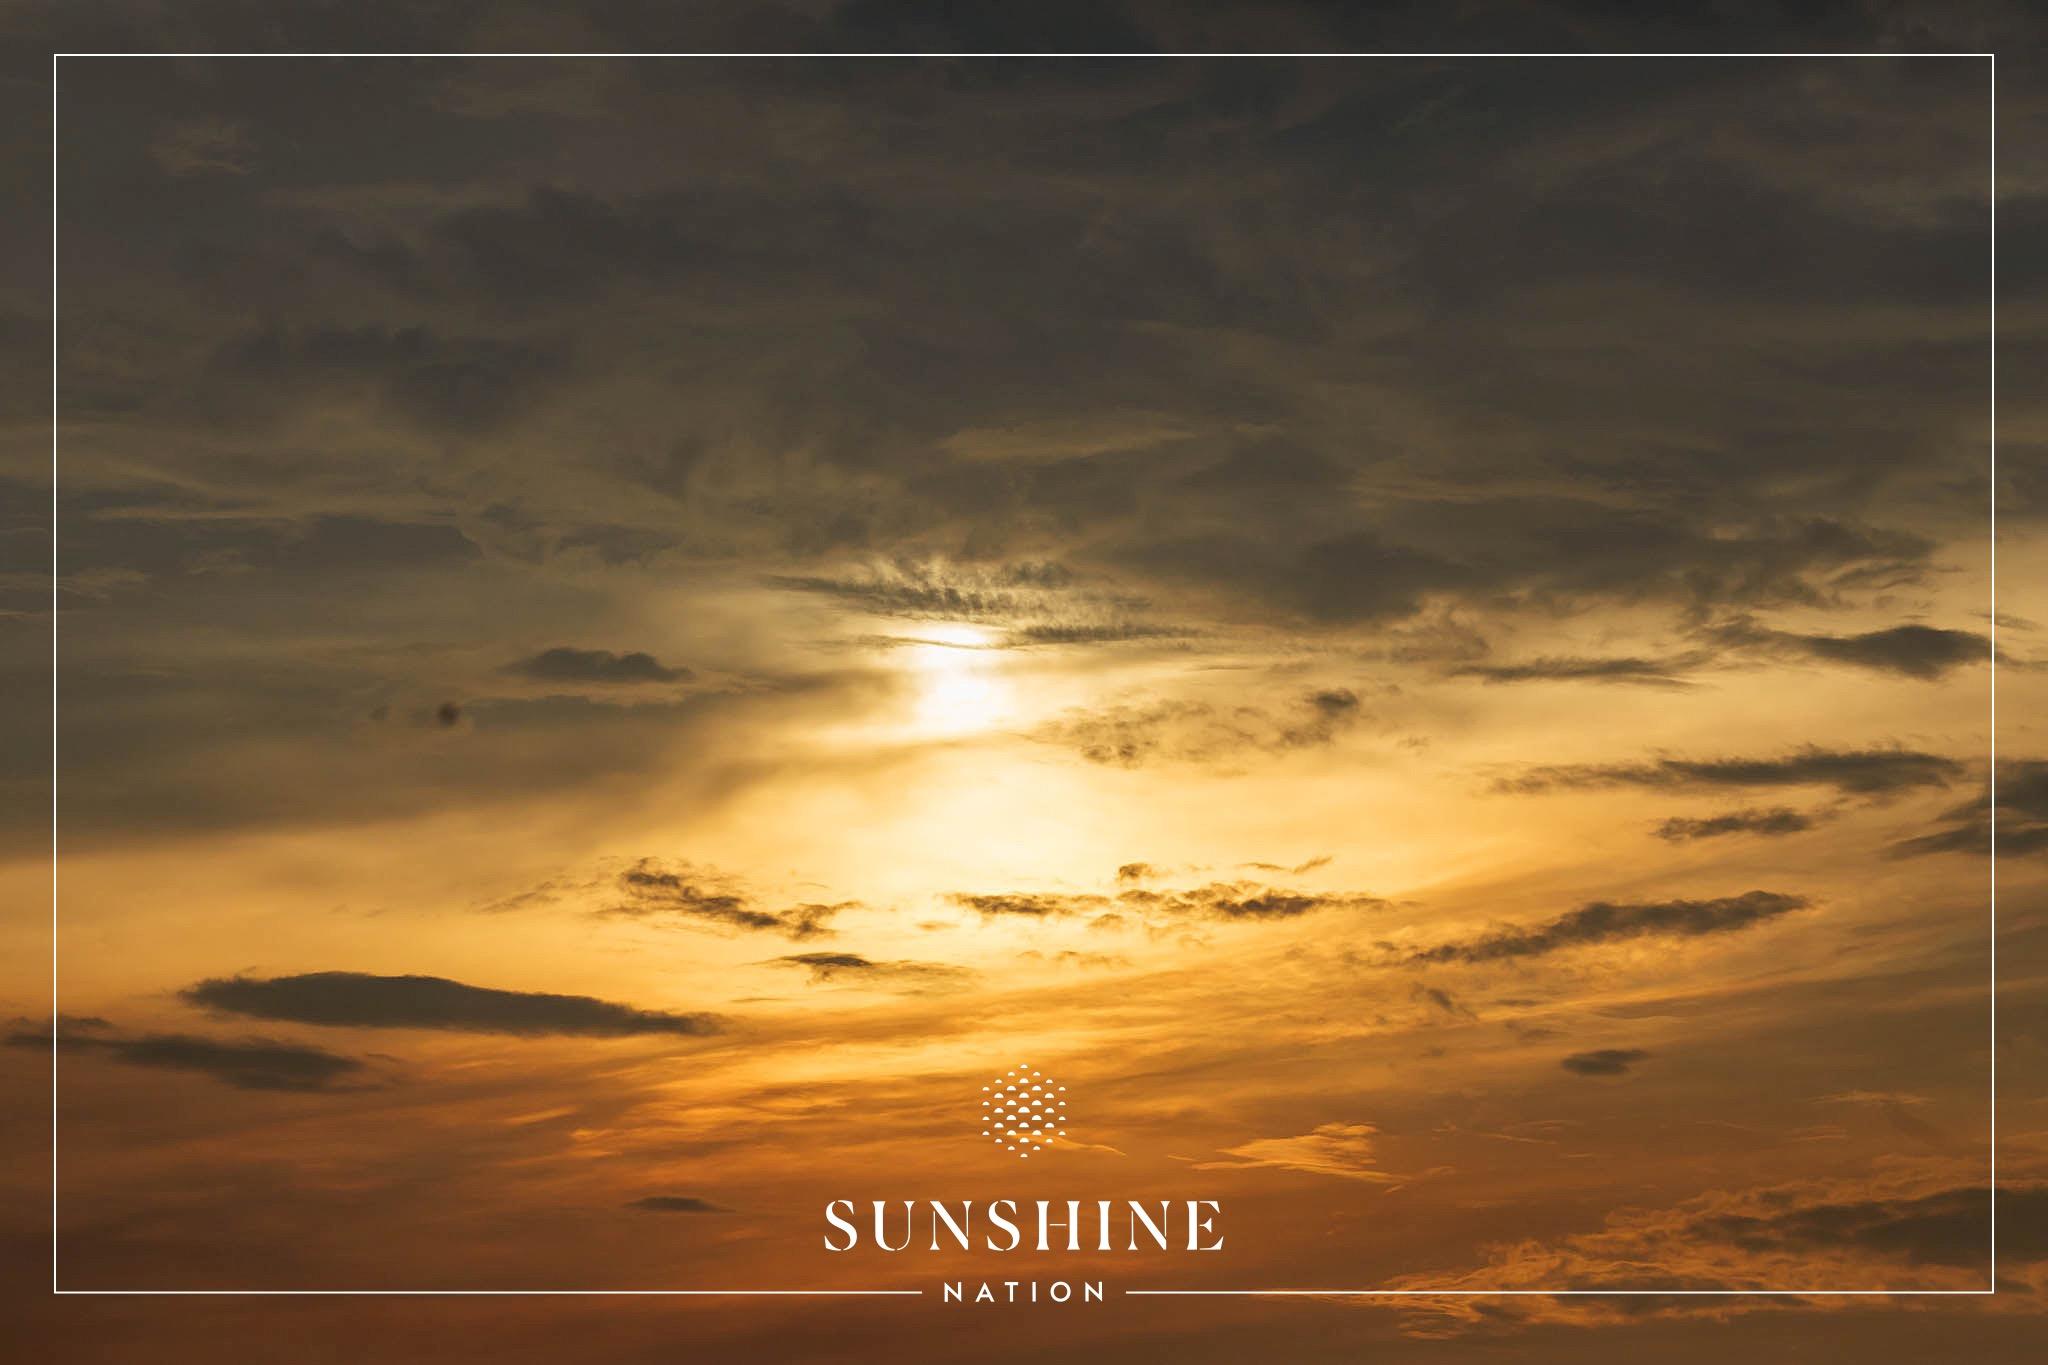 07102017_SunshineNation_Colossal080_Watermarked.jpg